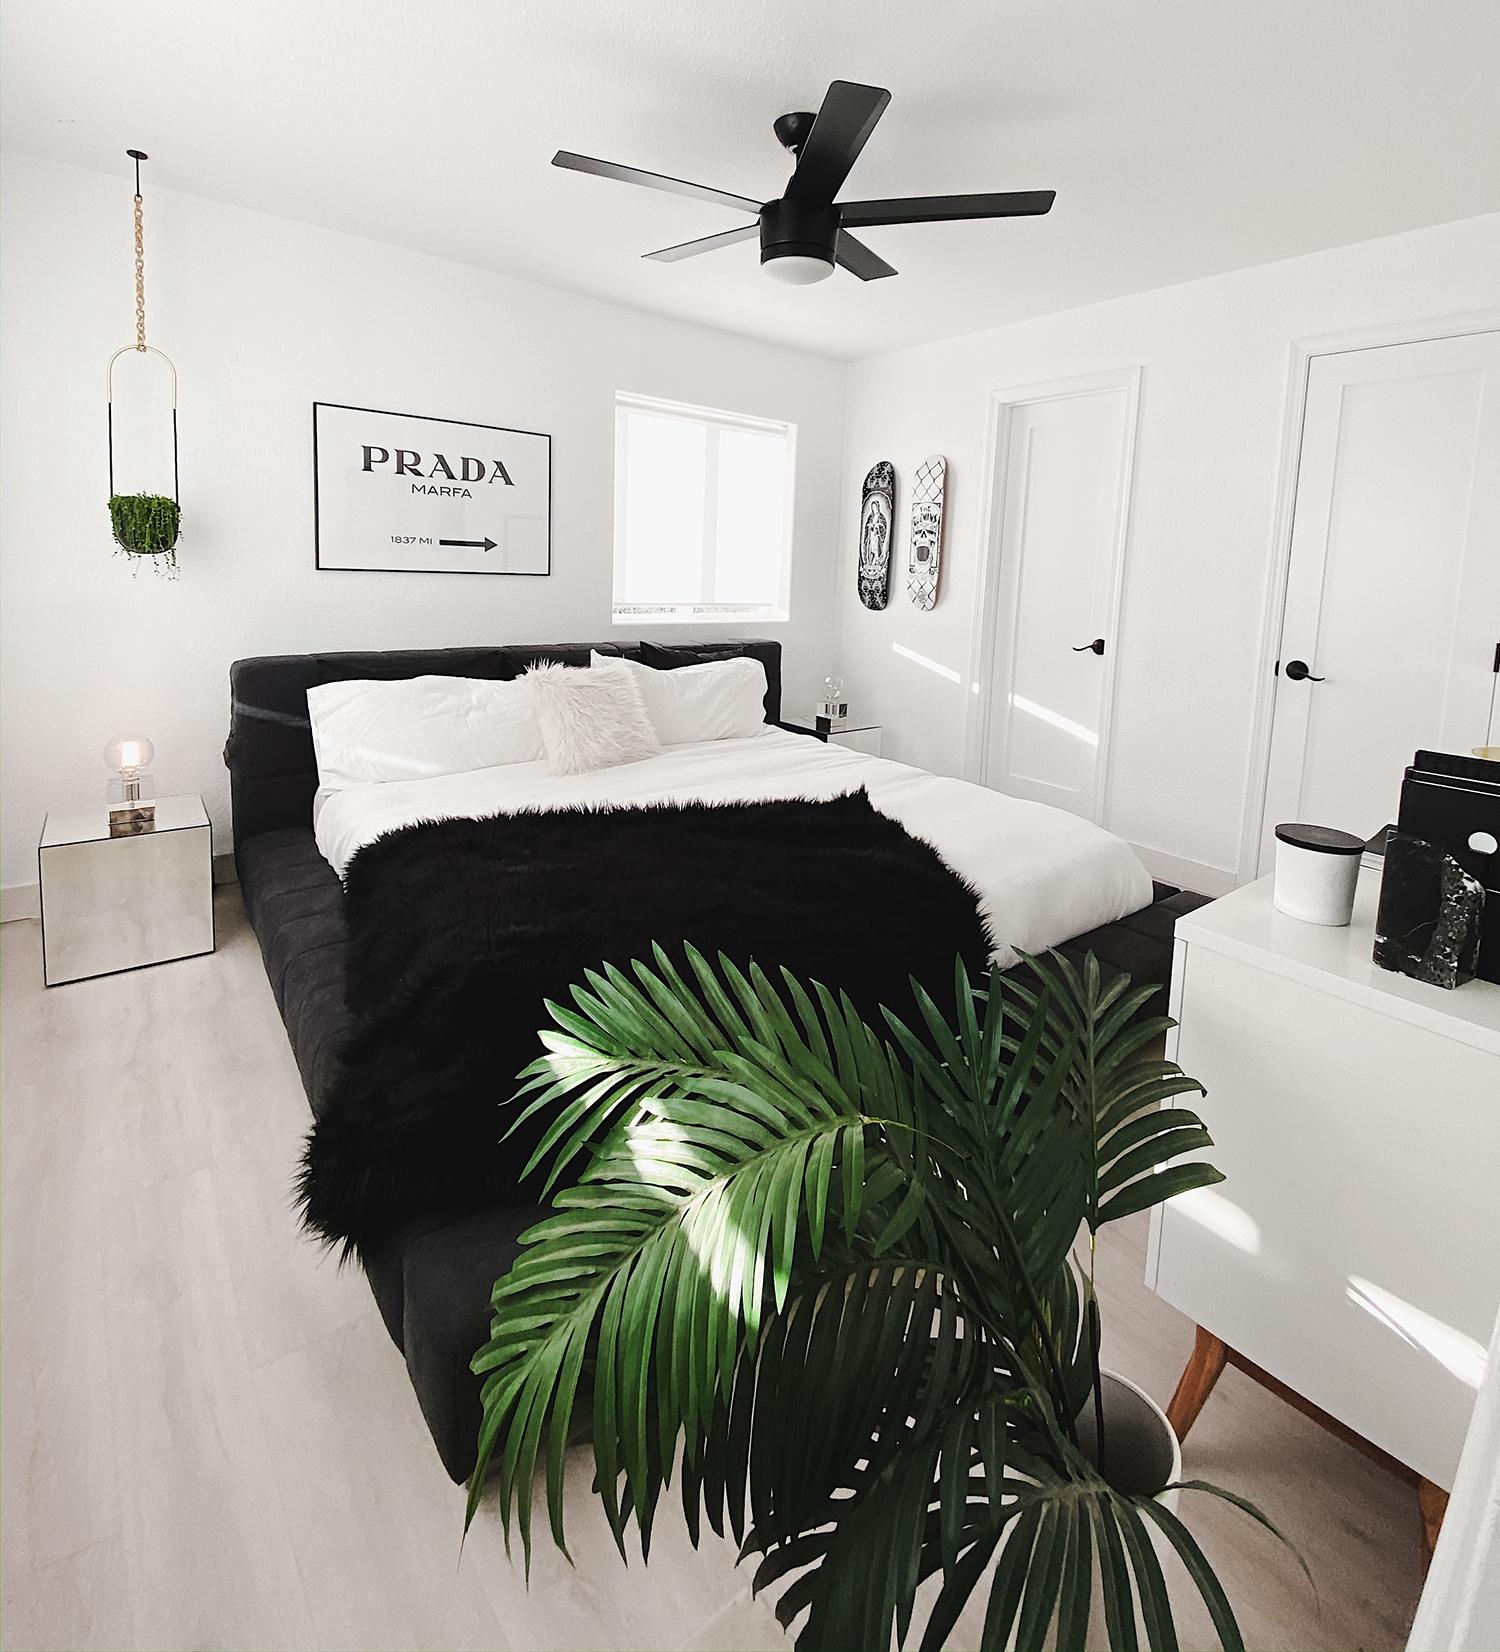 Our Black & White Gender Neutral Master Bedroom